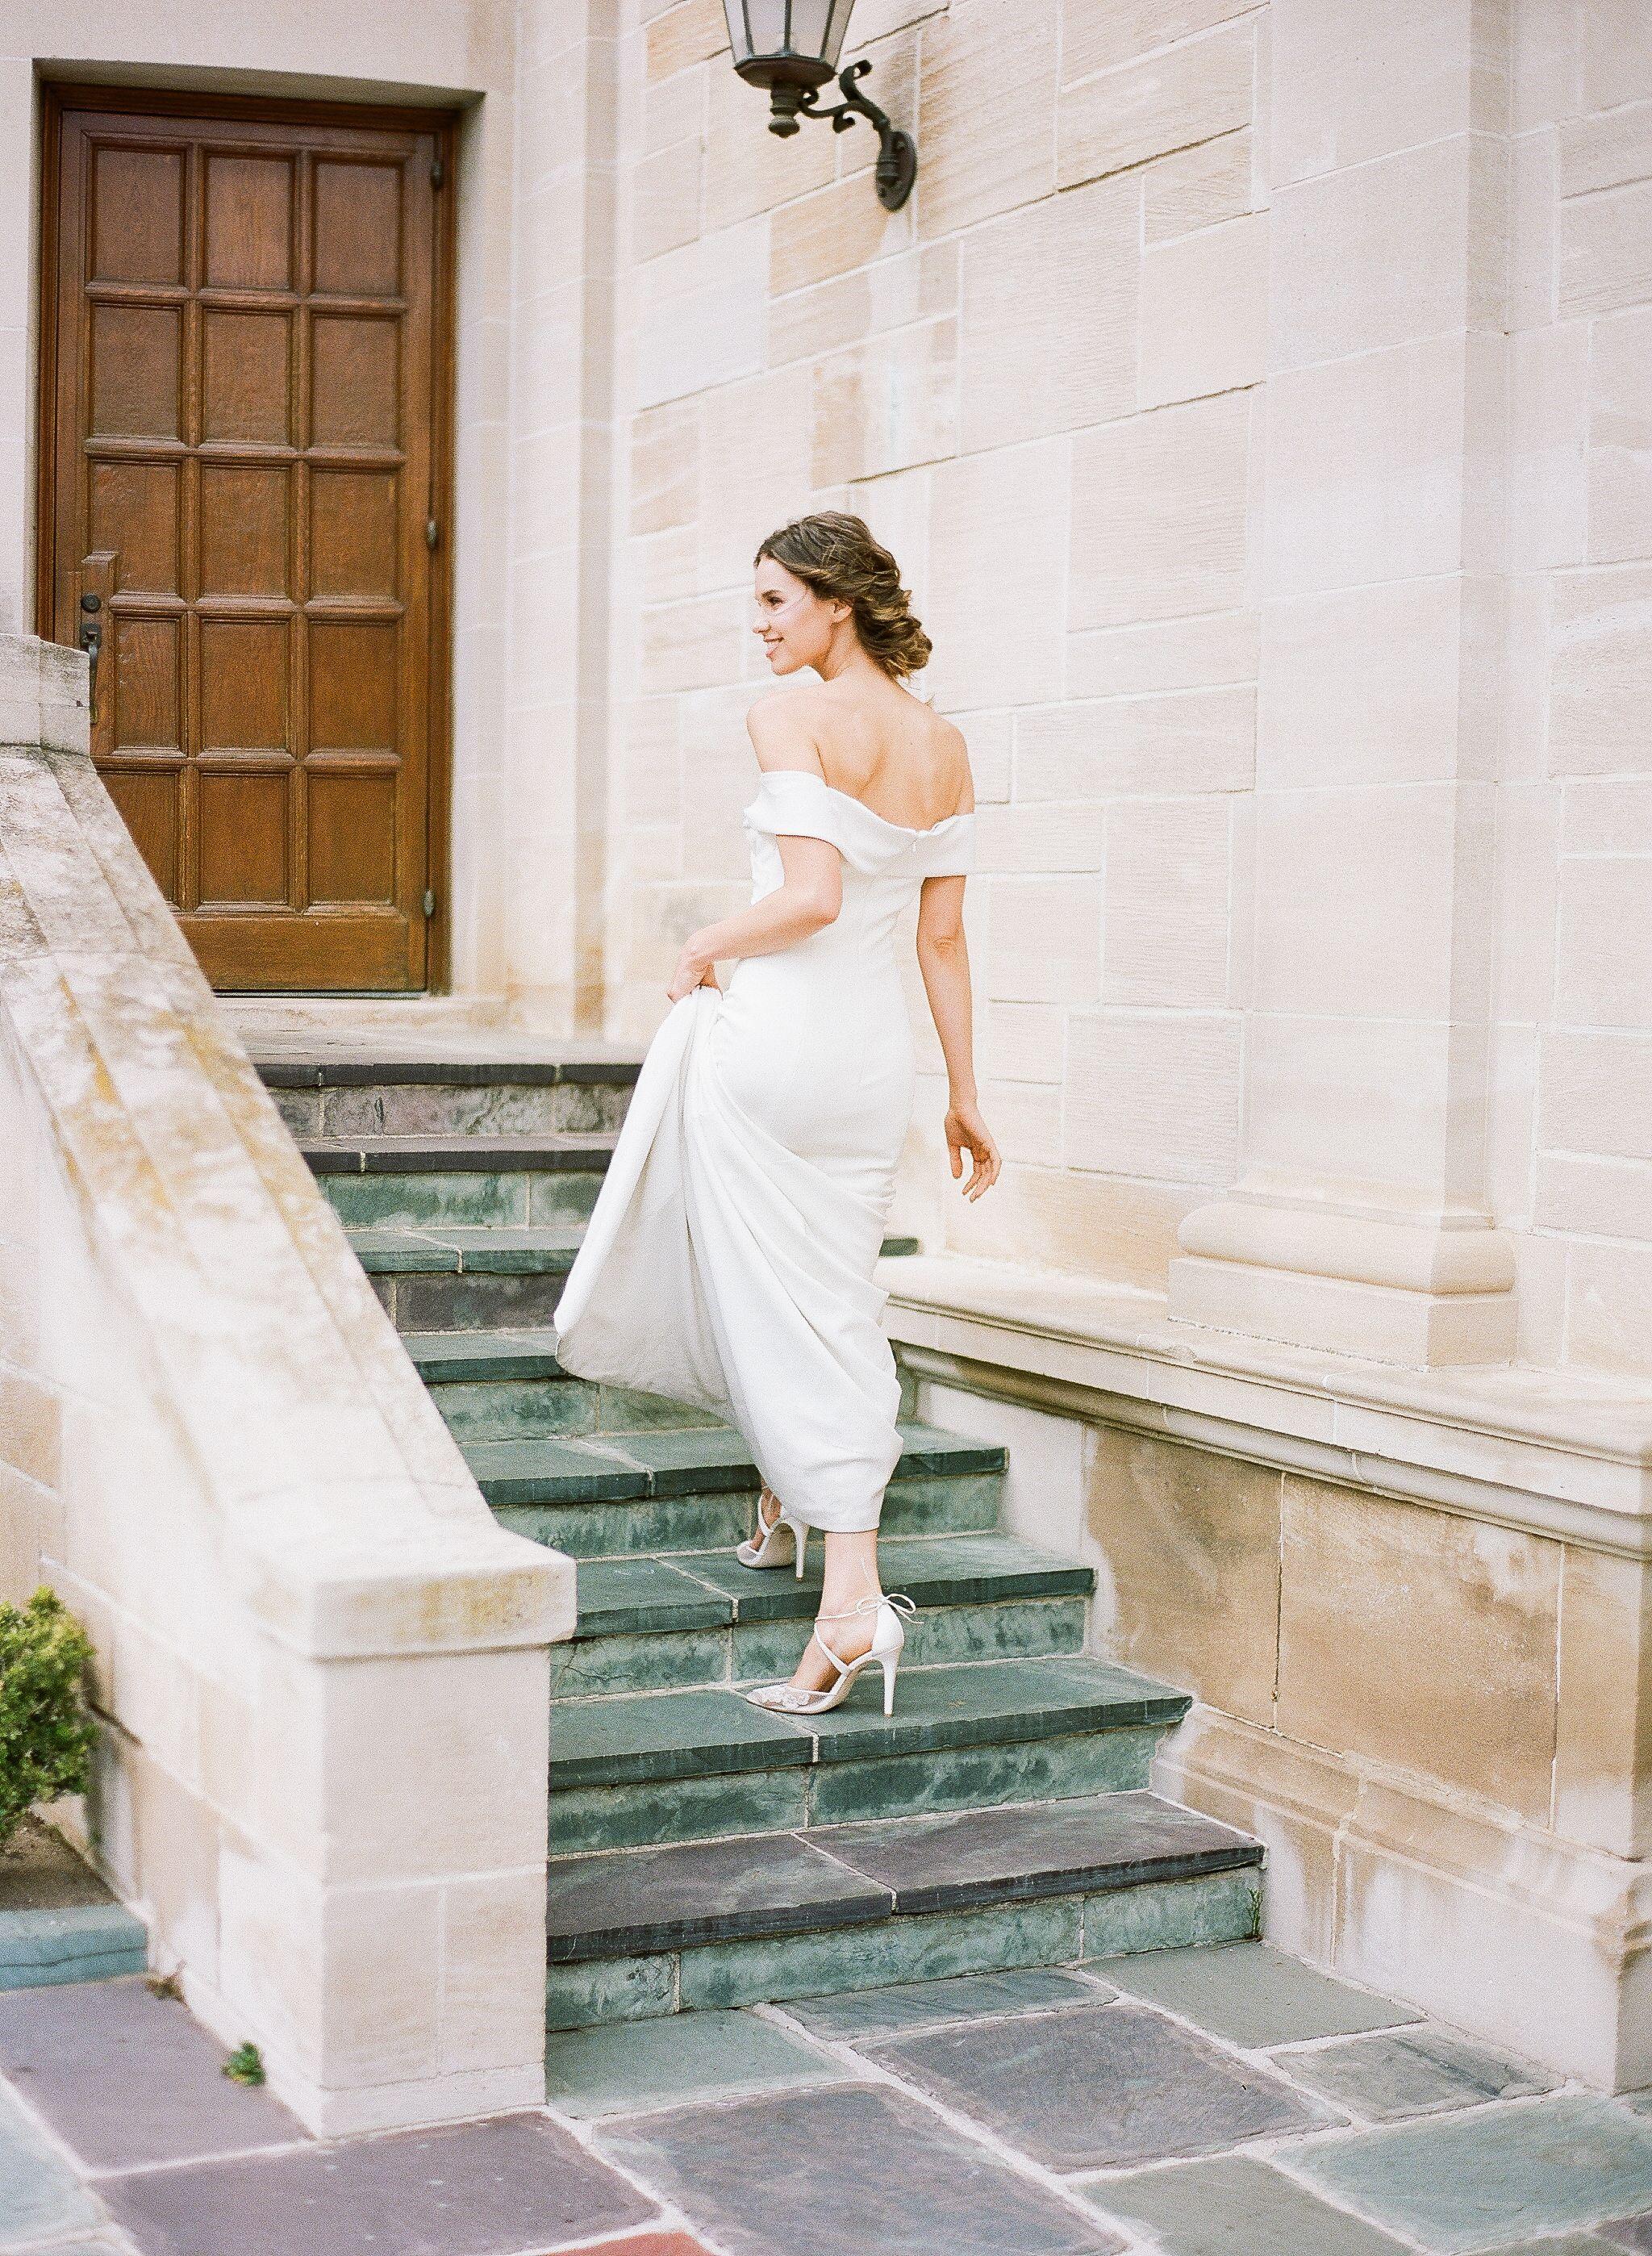 Greystone Mansion Destination Shoot Wedding Photography